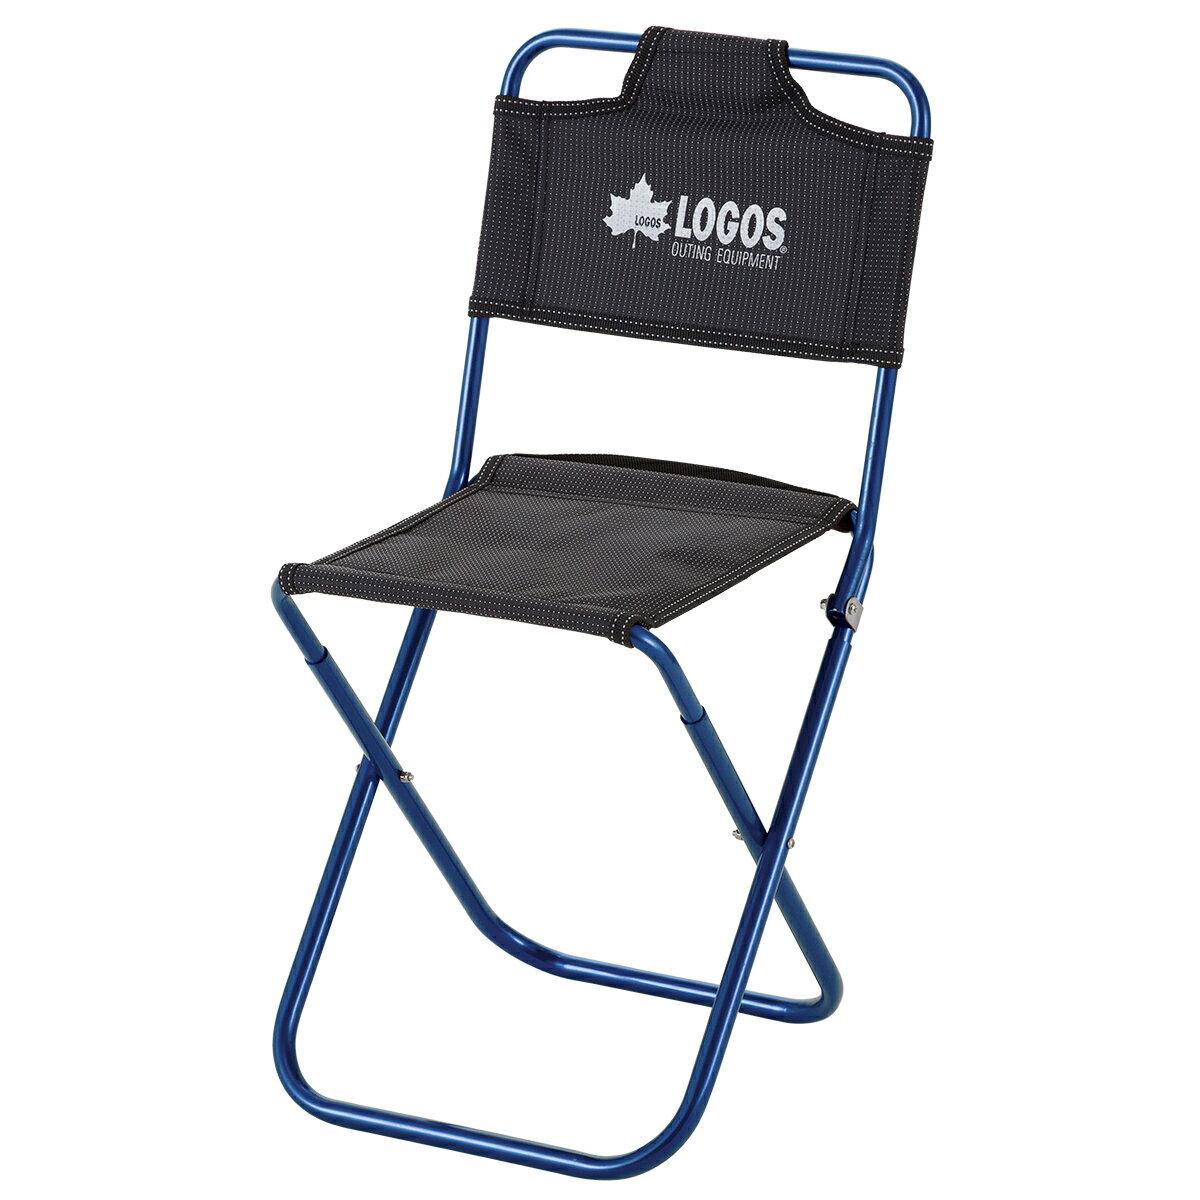 LOGOS/ロゴス 7075トレックチェア(背付)レッド トレッキングに最適な経理用でコンパクトな1人用チェア 椅子